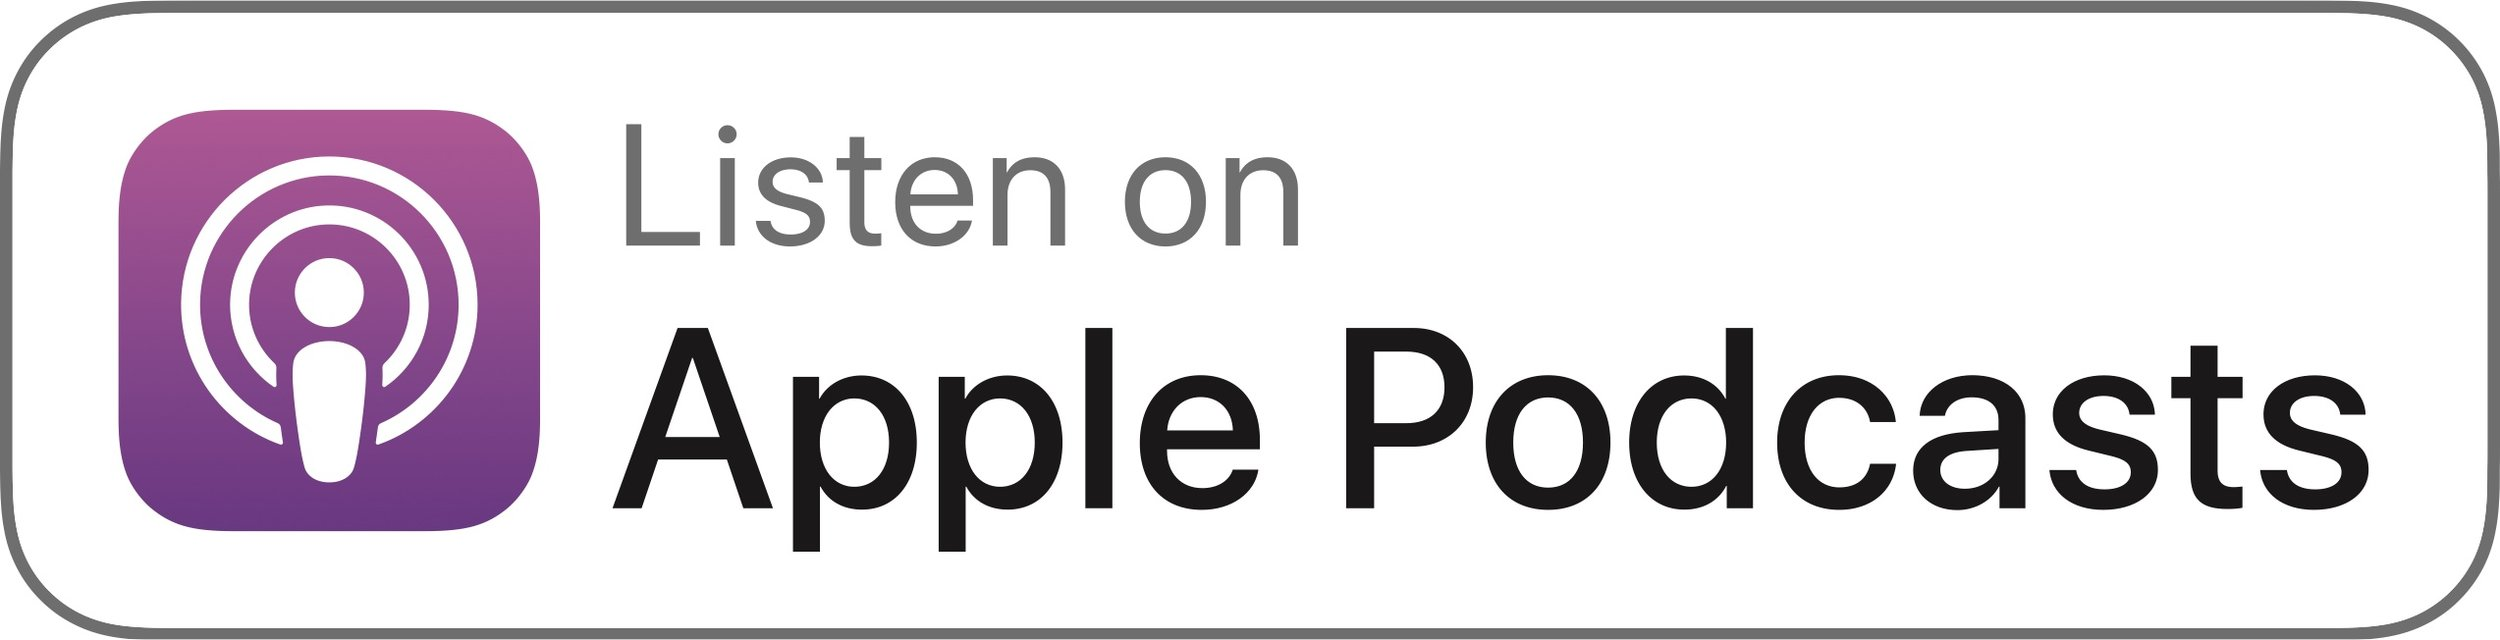 Apple Podcast Image.jpg